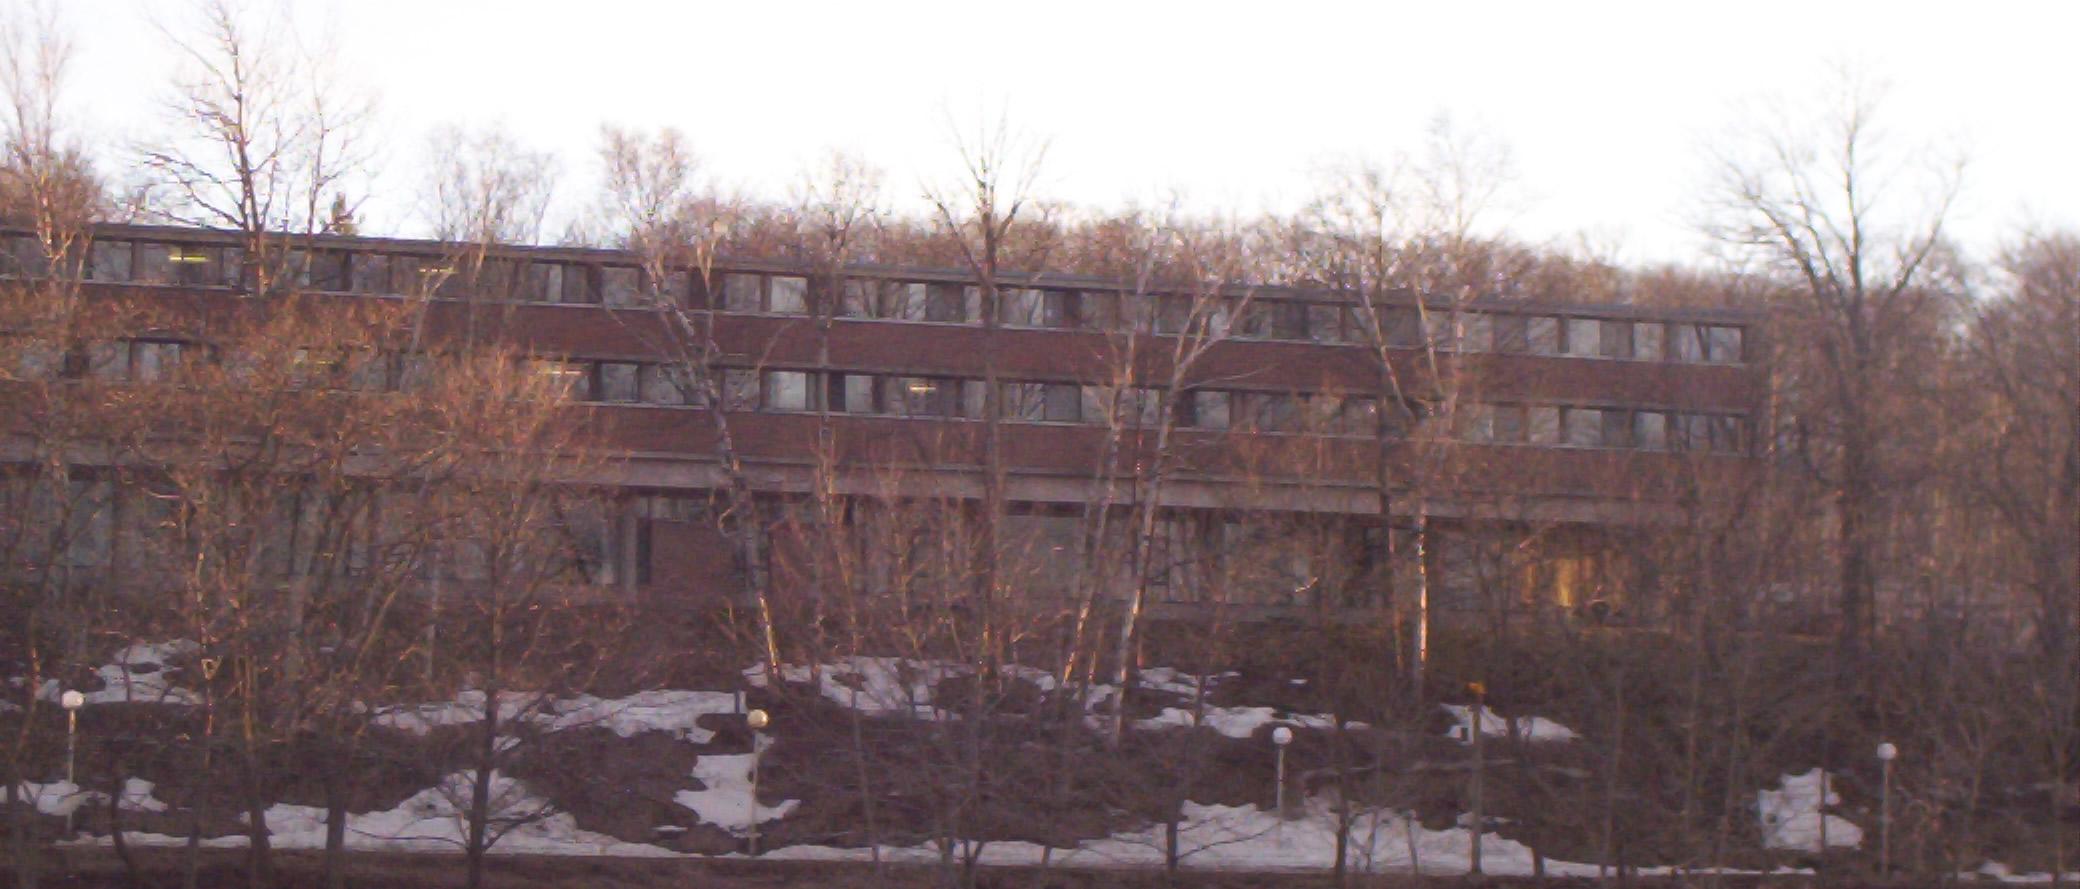 Michigan Technological University Mcnair Residence Hall